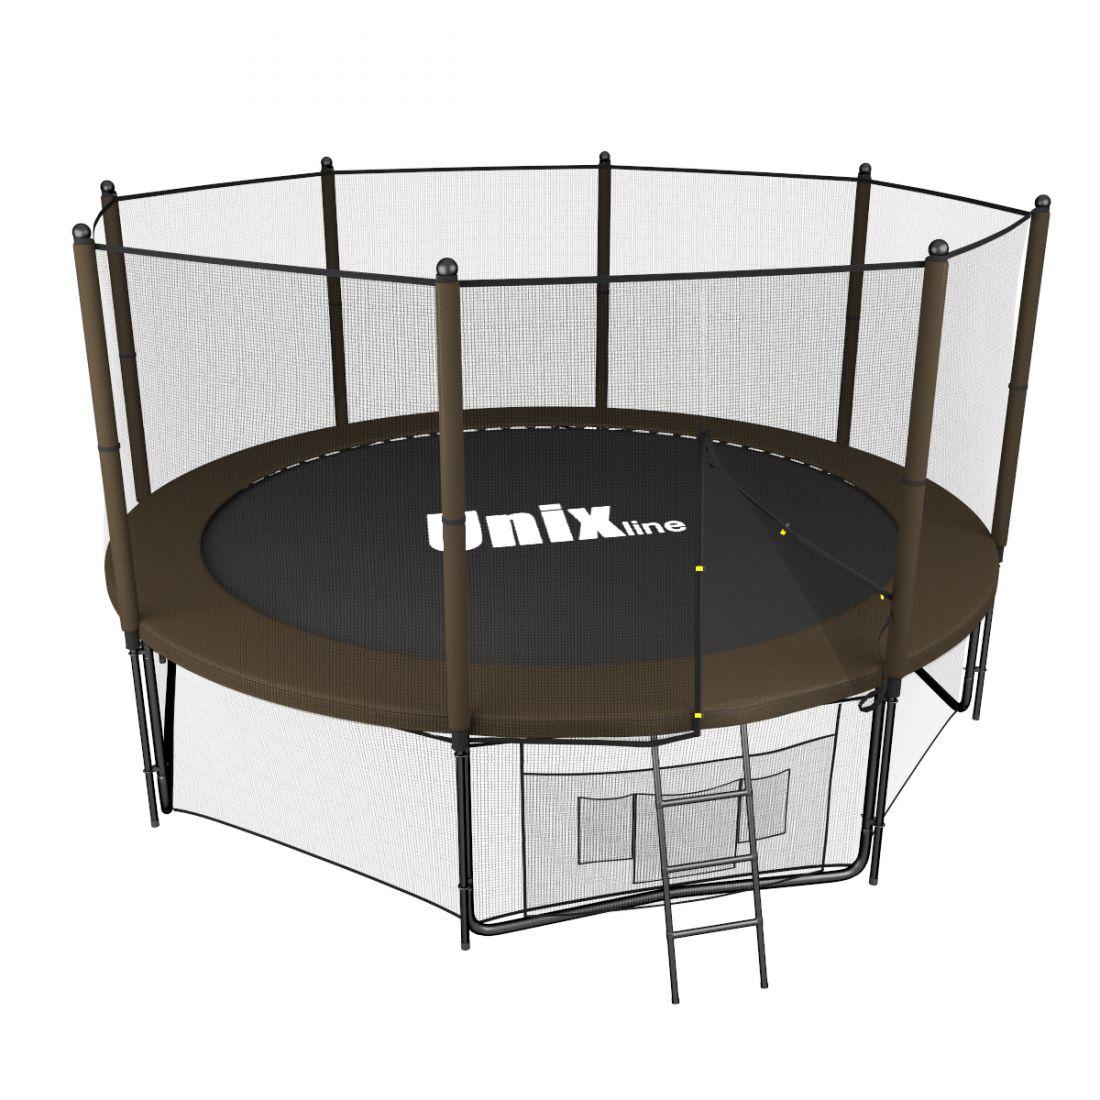 Батут UNIX line 12 ft (3.66 м, до 160 кг) Black&Brown (outside)